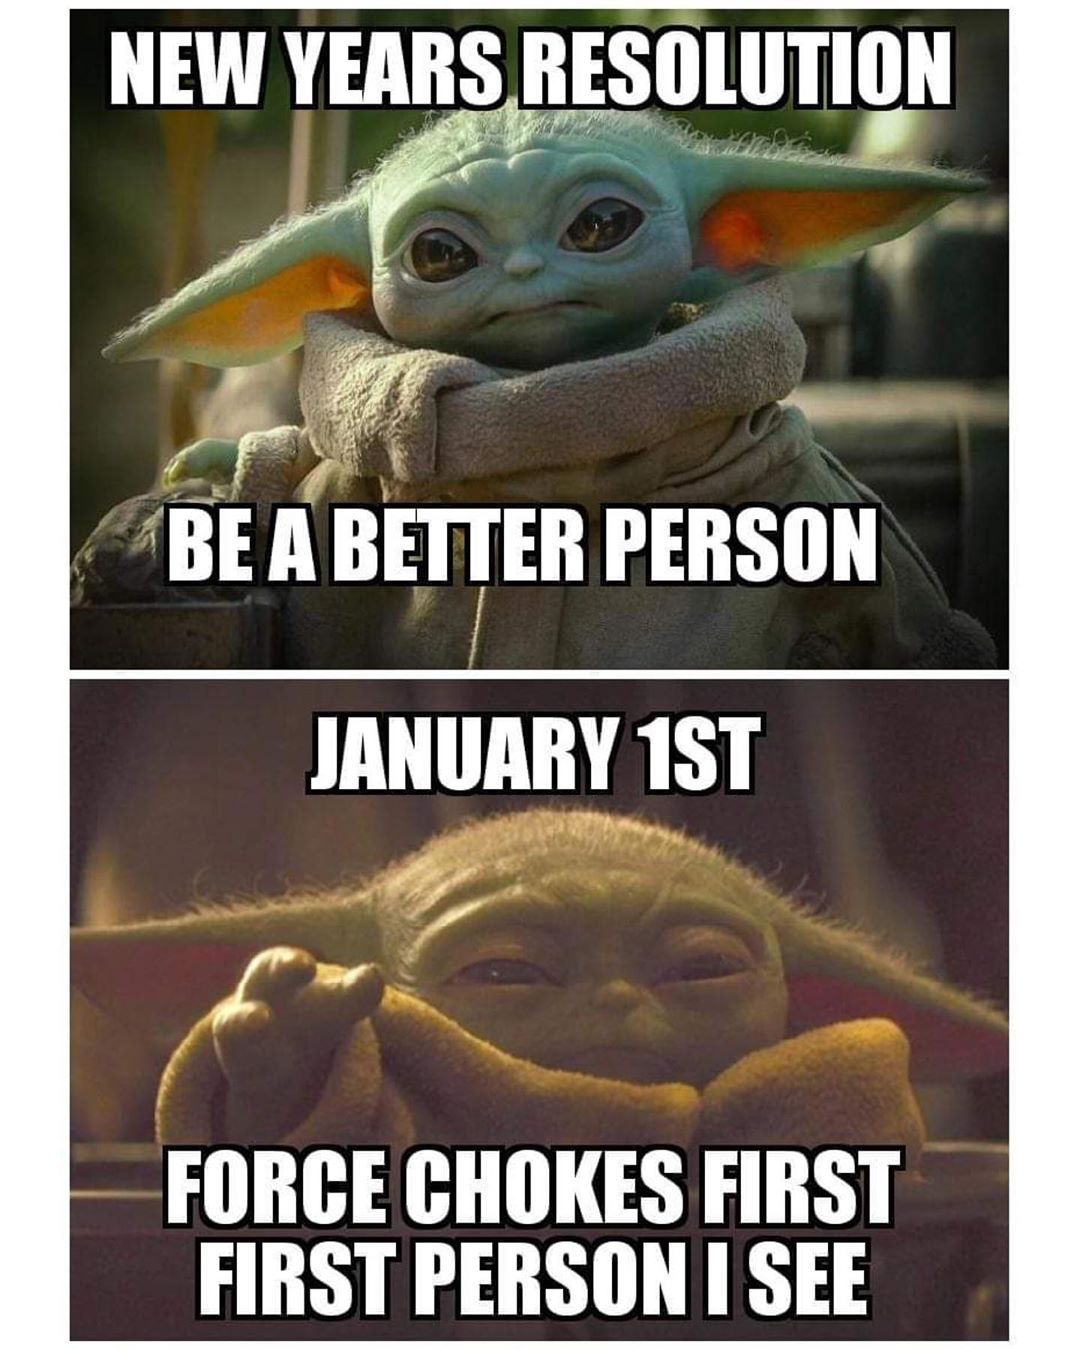 Amanda Starwarsfangirl On Instagram At Work Less Than An Hour This Morning And Wanted To Do This Babyyoda Yoda Funny Funny Star Wars Memes Yoda Meme